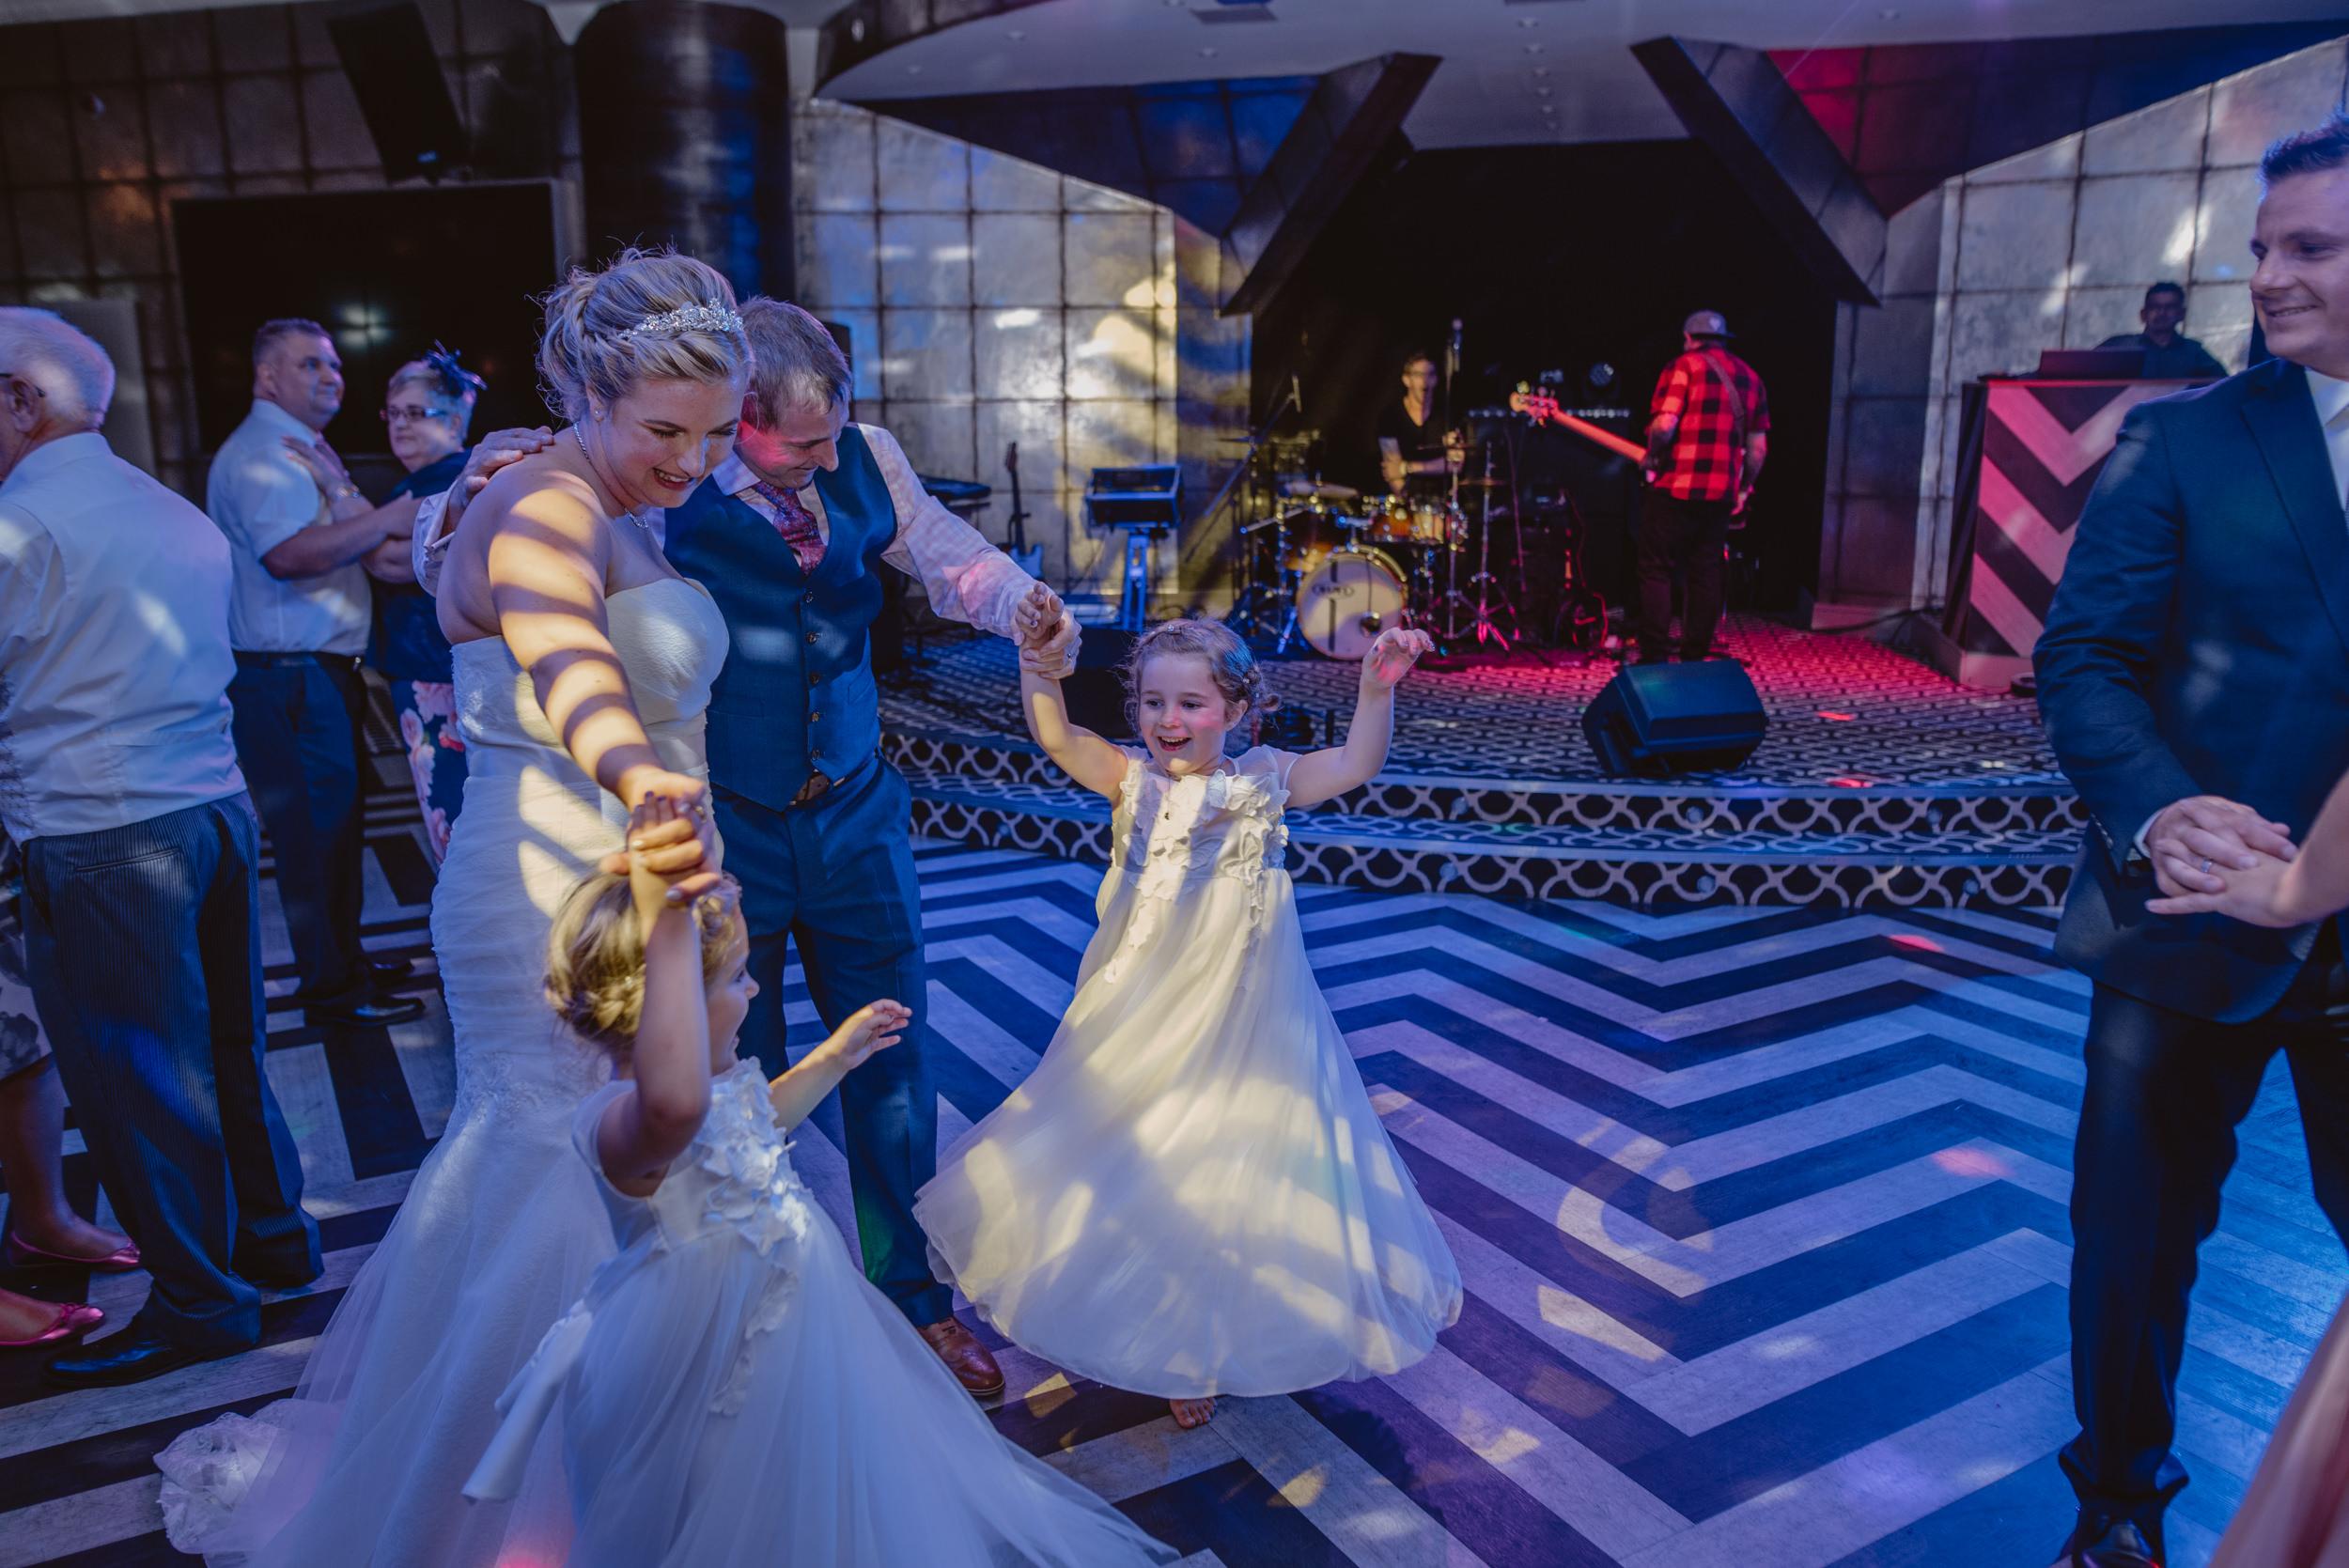 Chantelle-and-Stephen-Old-Thorns-Hotel-Wedding-Liphook-Manu-Mendoza-Wedding-Photography-563.jpg